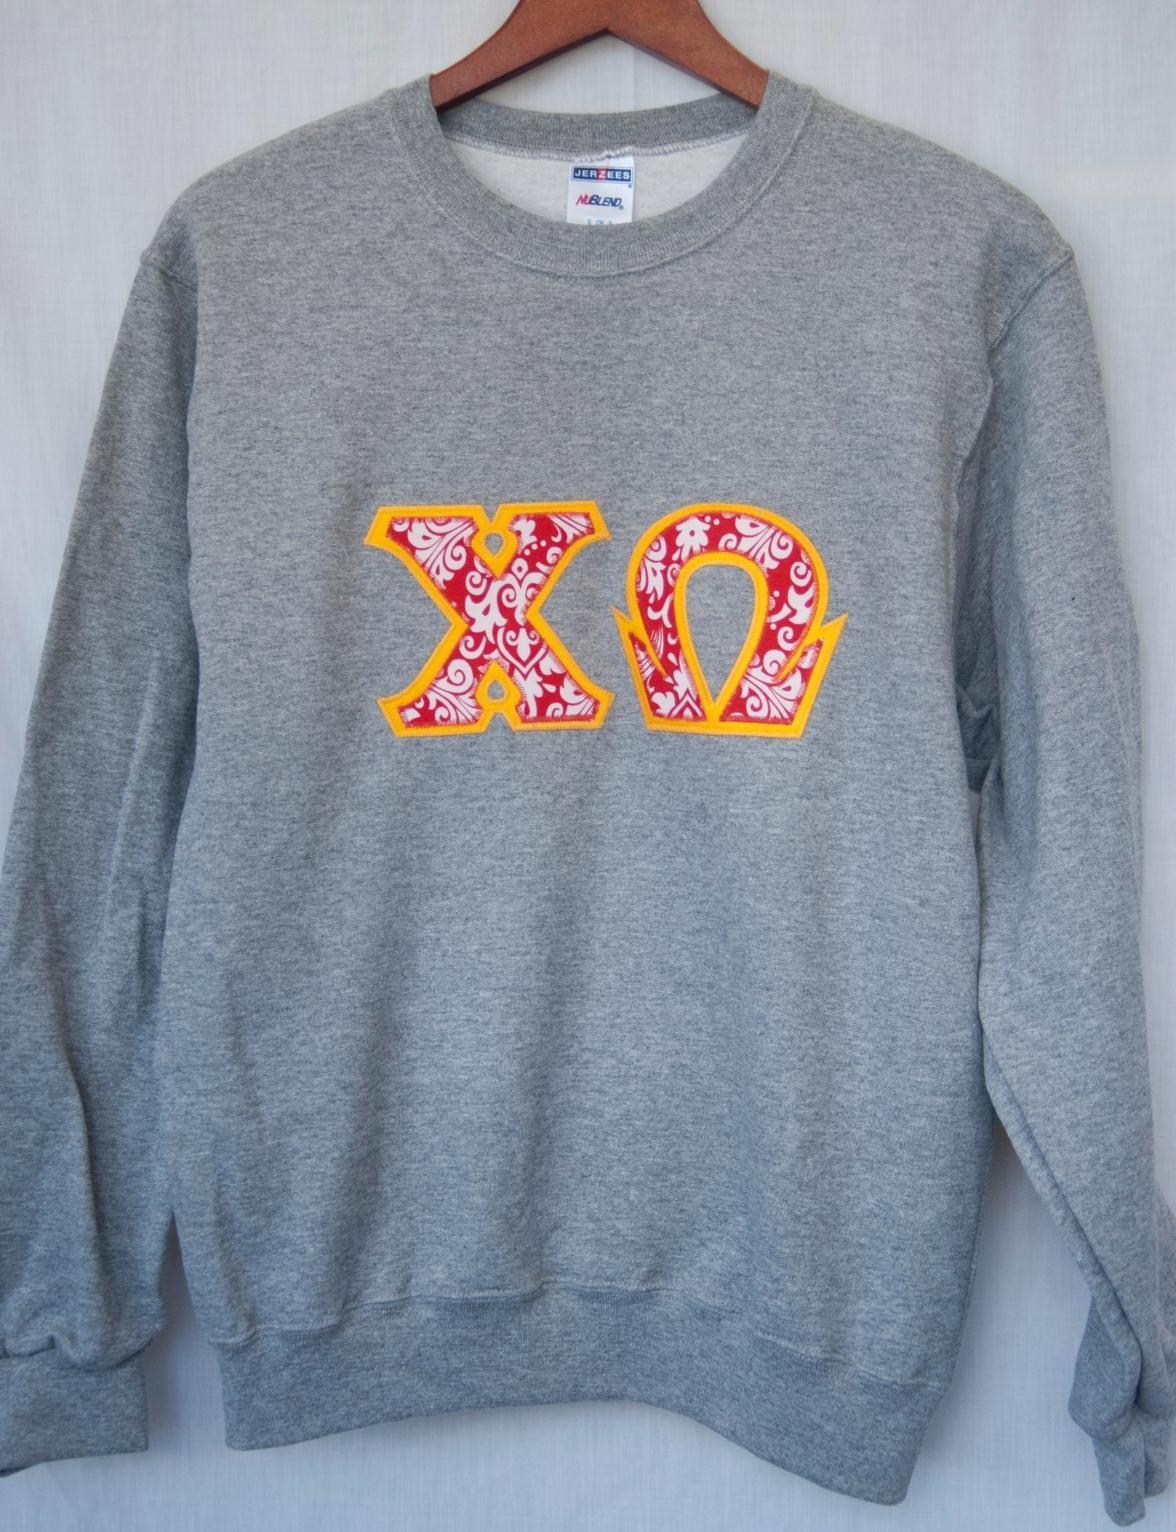 Crew Sweatshirt 8oz - Oxford | http://goo.gl/qyg21Z